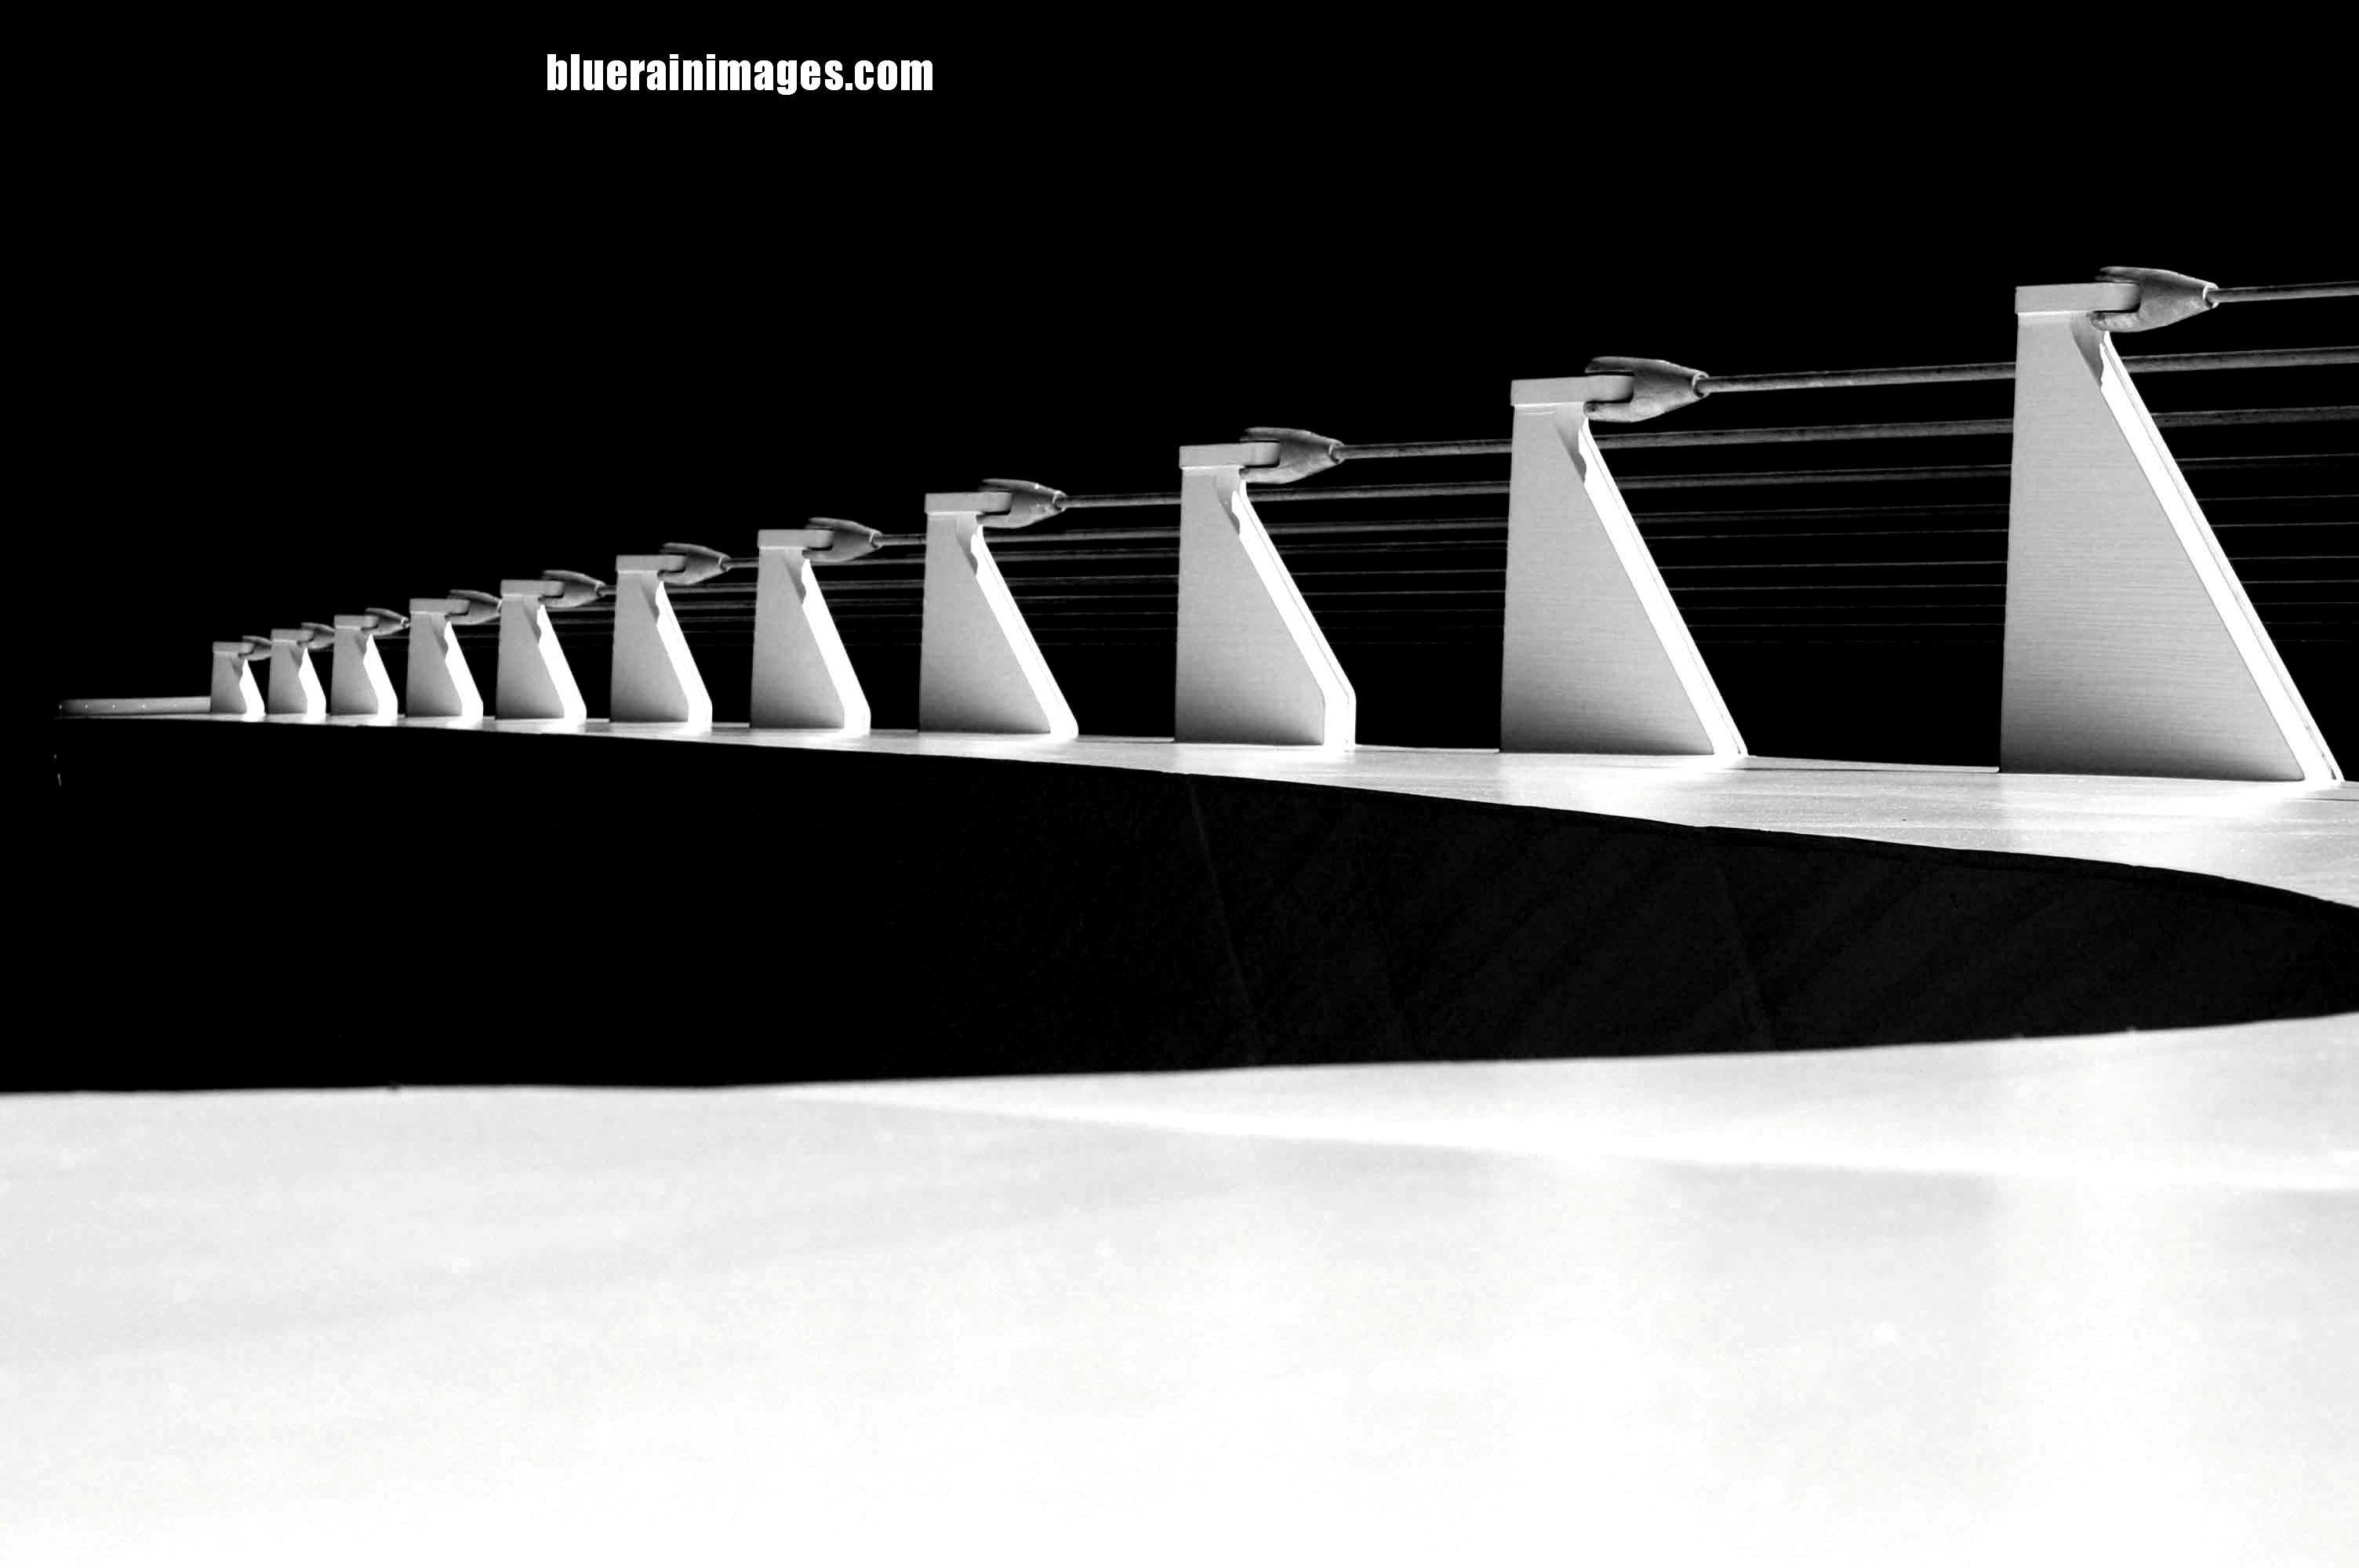 Architecture Photo By bluerainimages